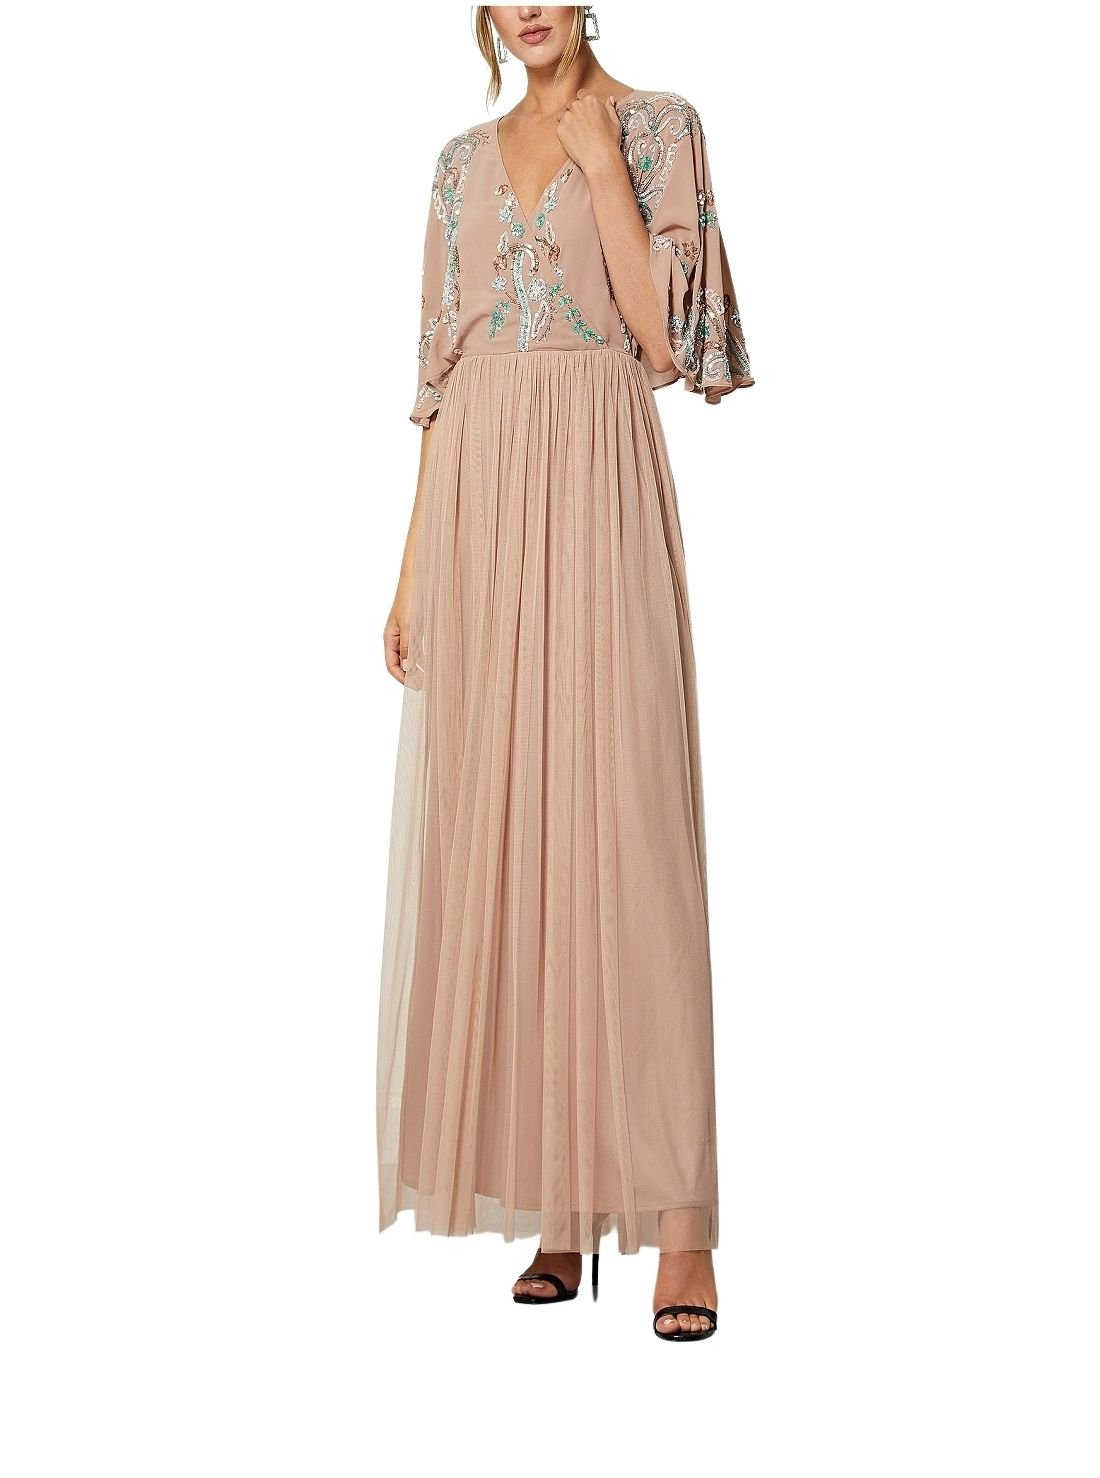 Wholesale Formal Boho Dress